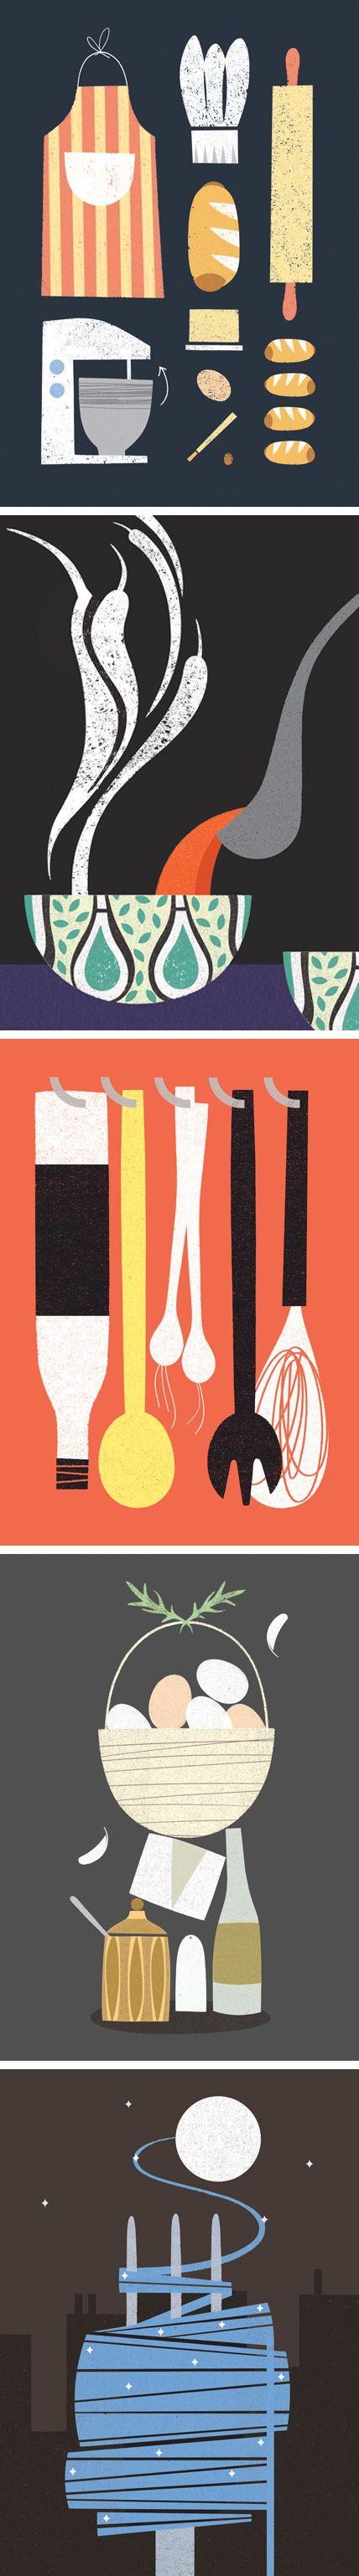 Recipe book illustrations by Ellie Tzoni